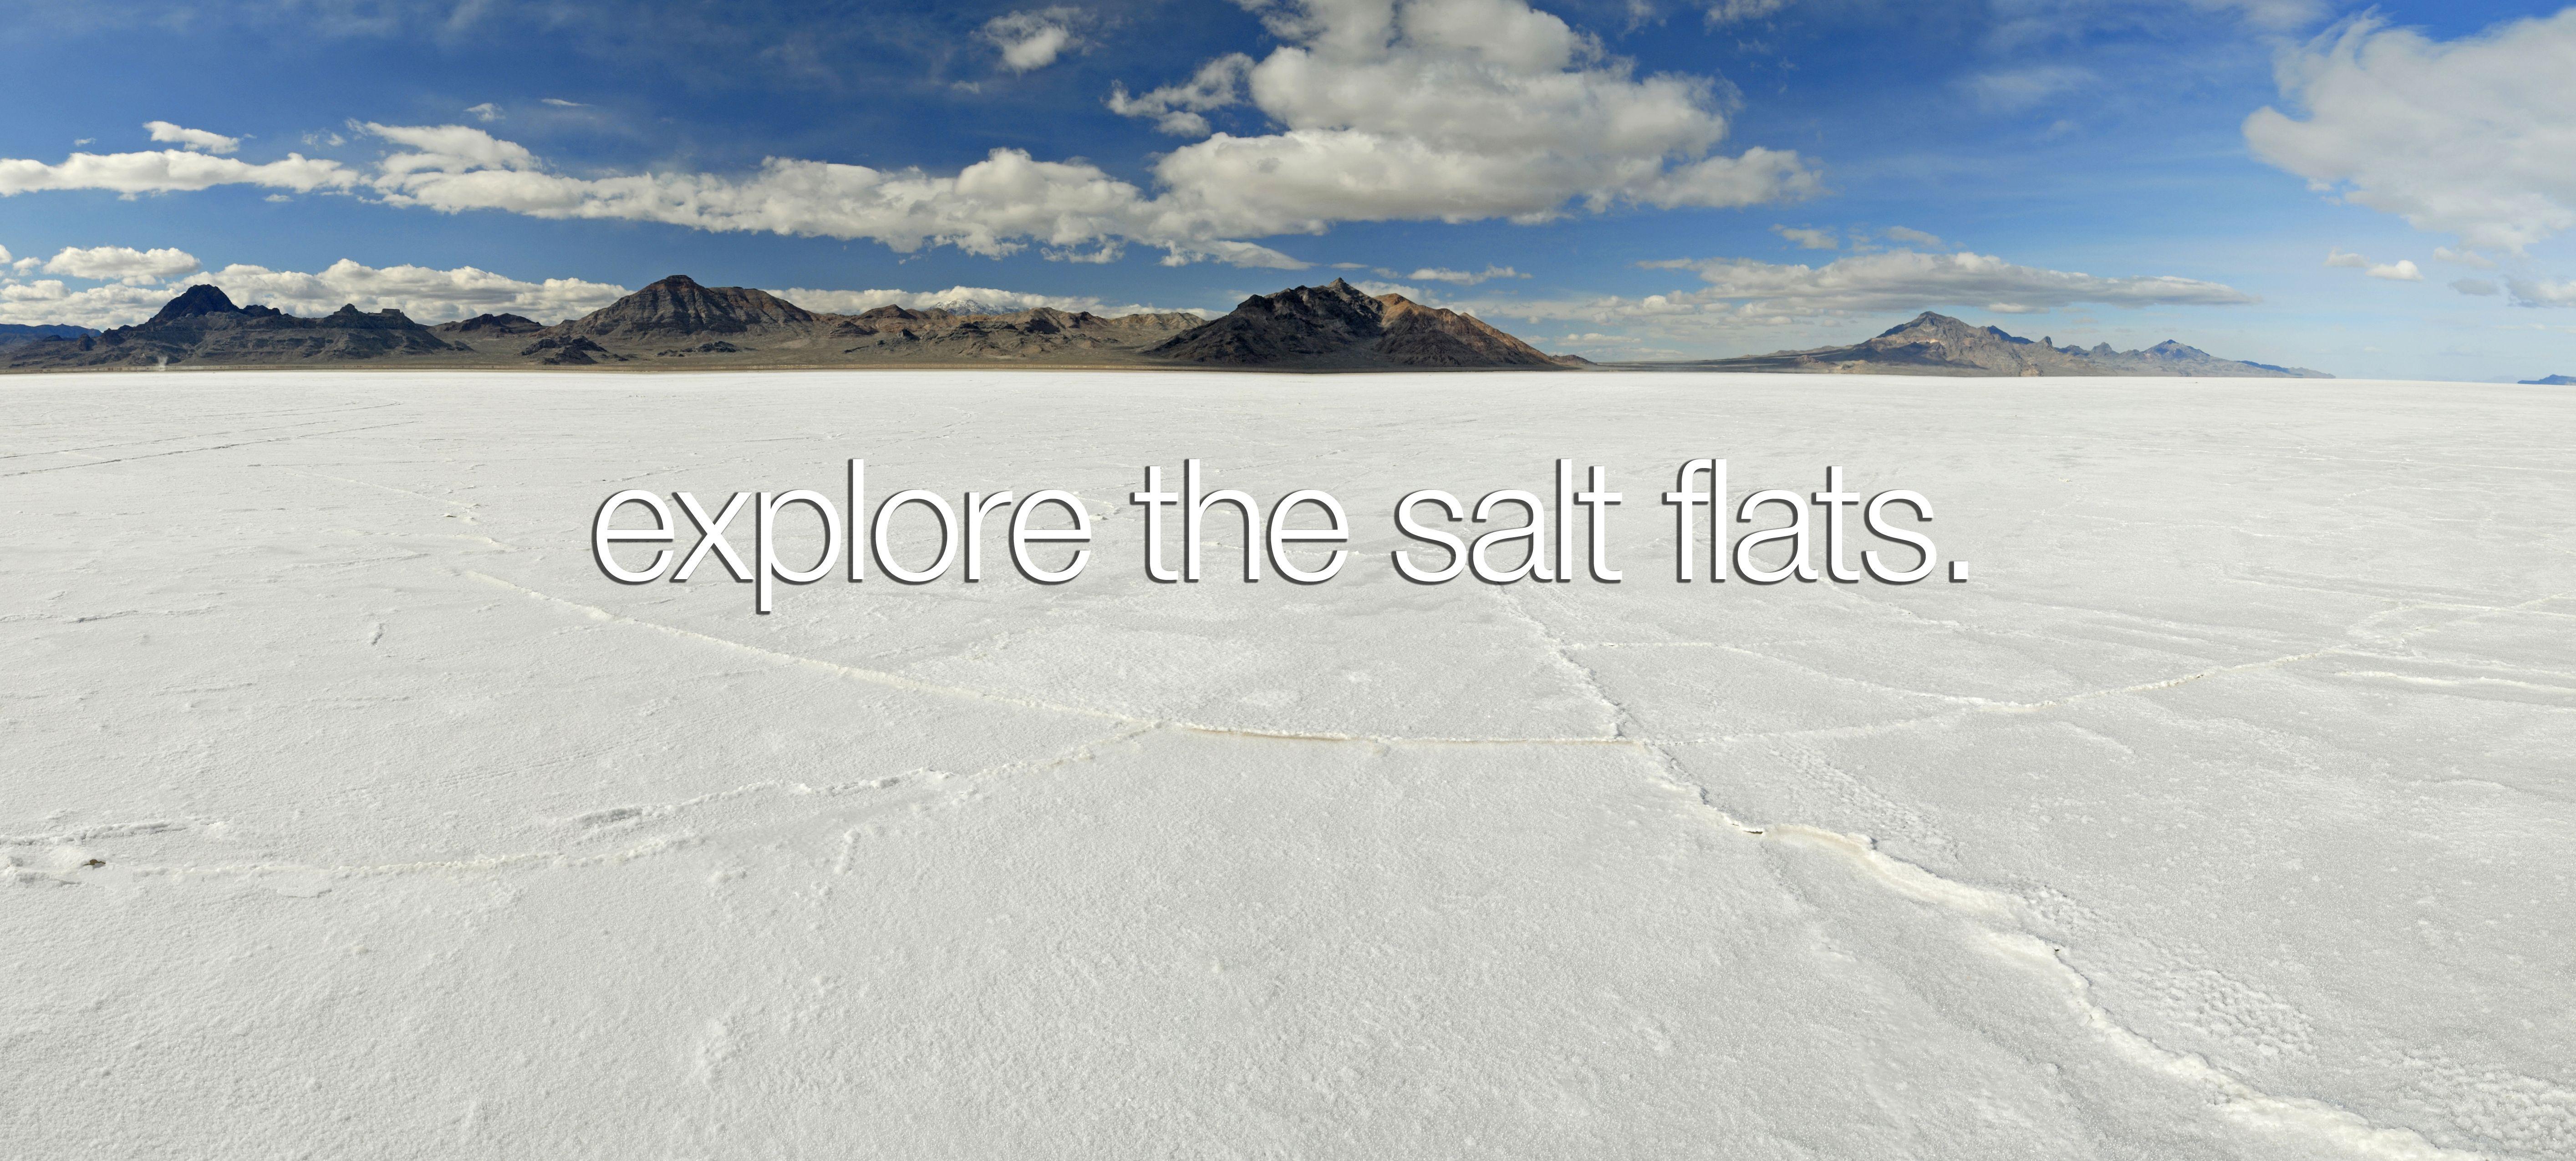 Bonneville Salt Flats, Utah after heavy rain | Travel and